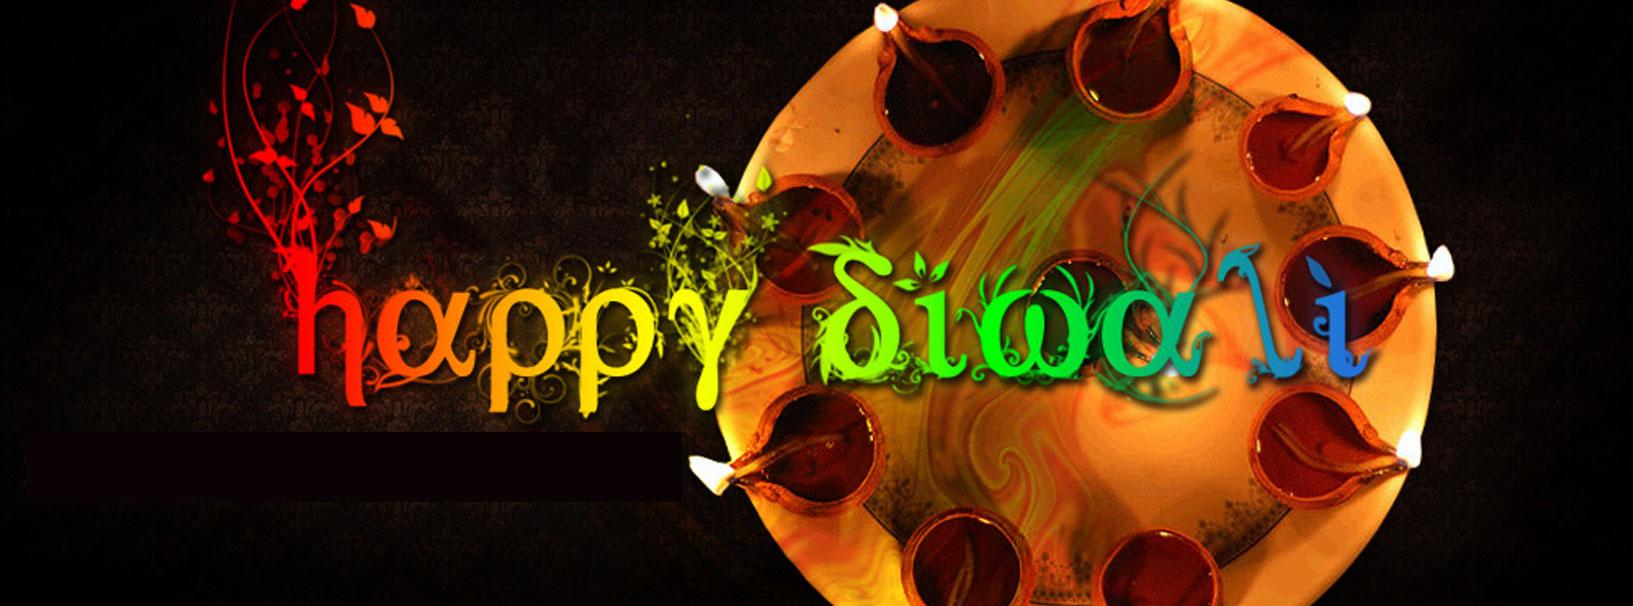 happy-diwali-greetings-hd-wallpapers2